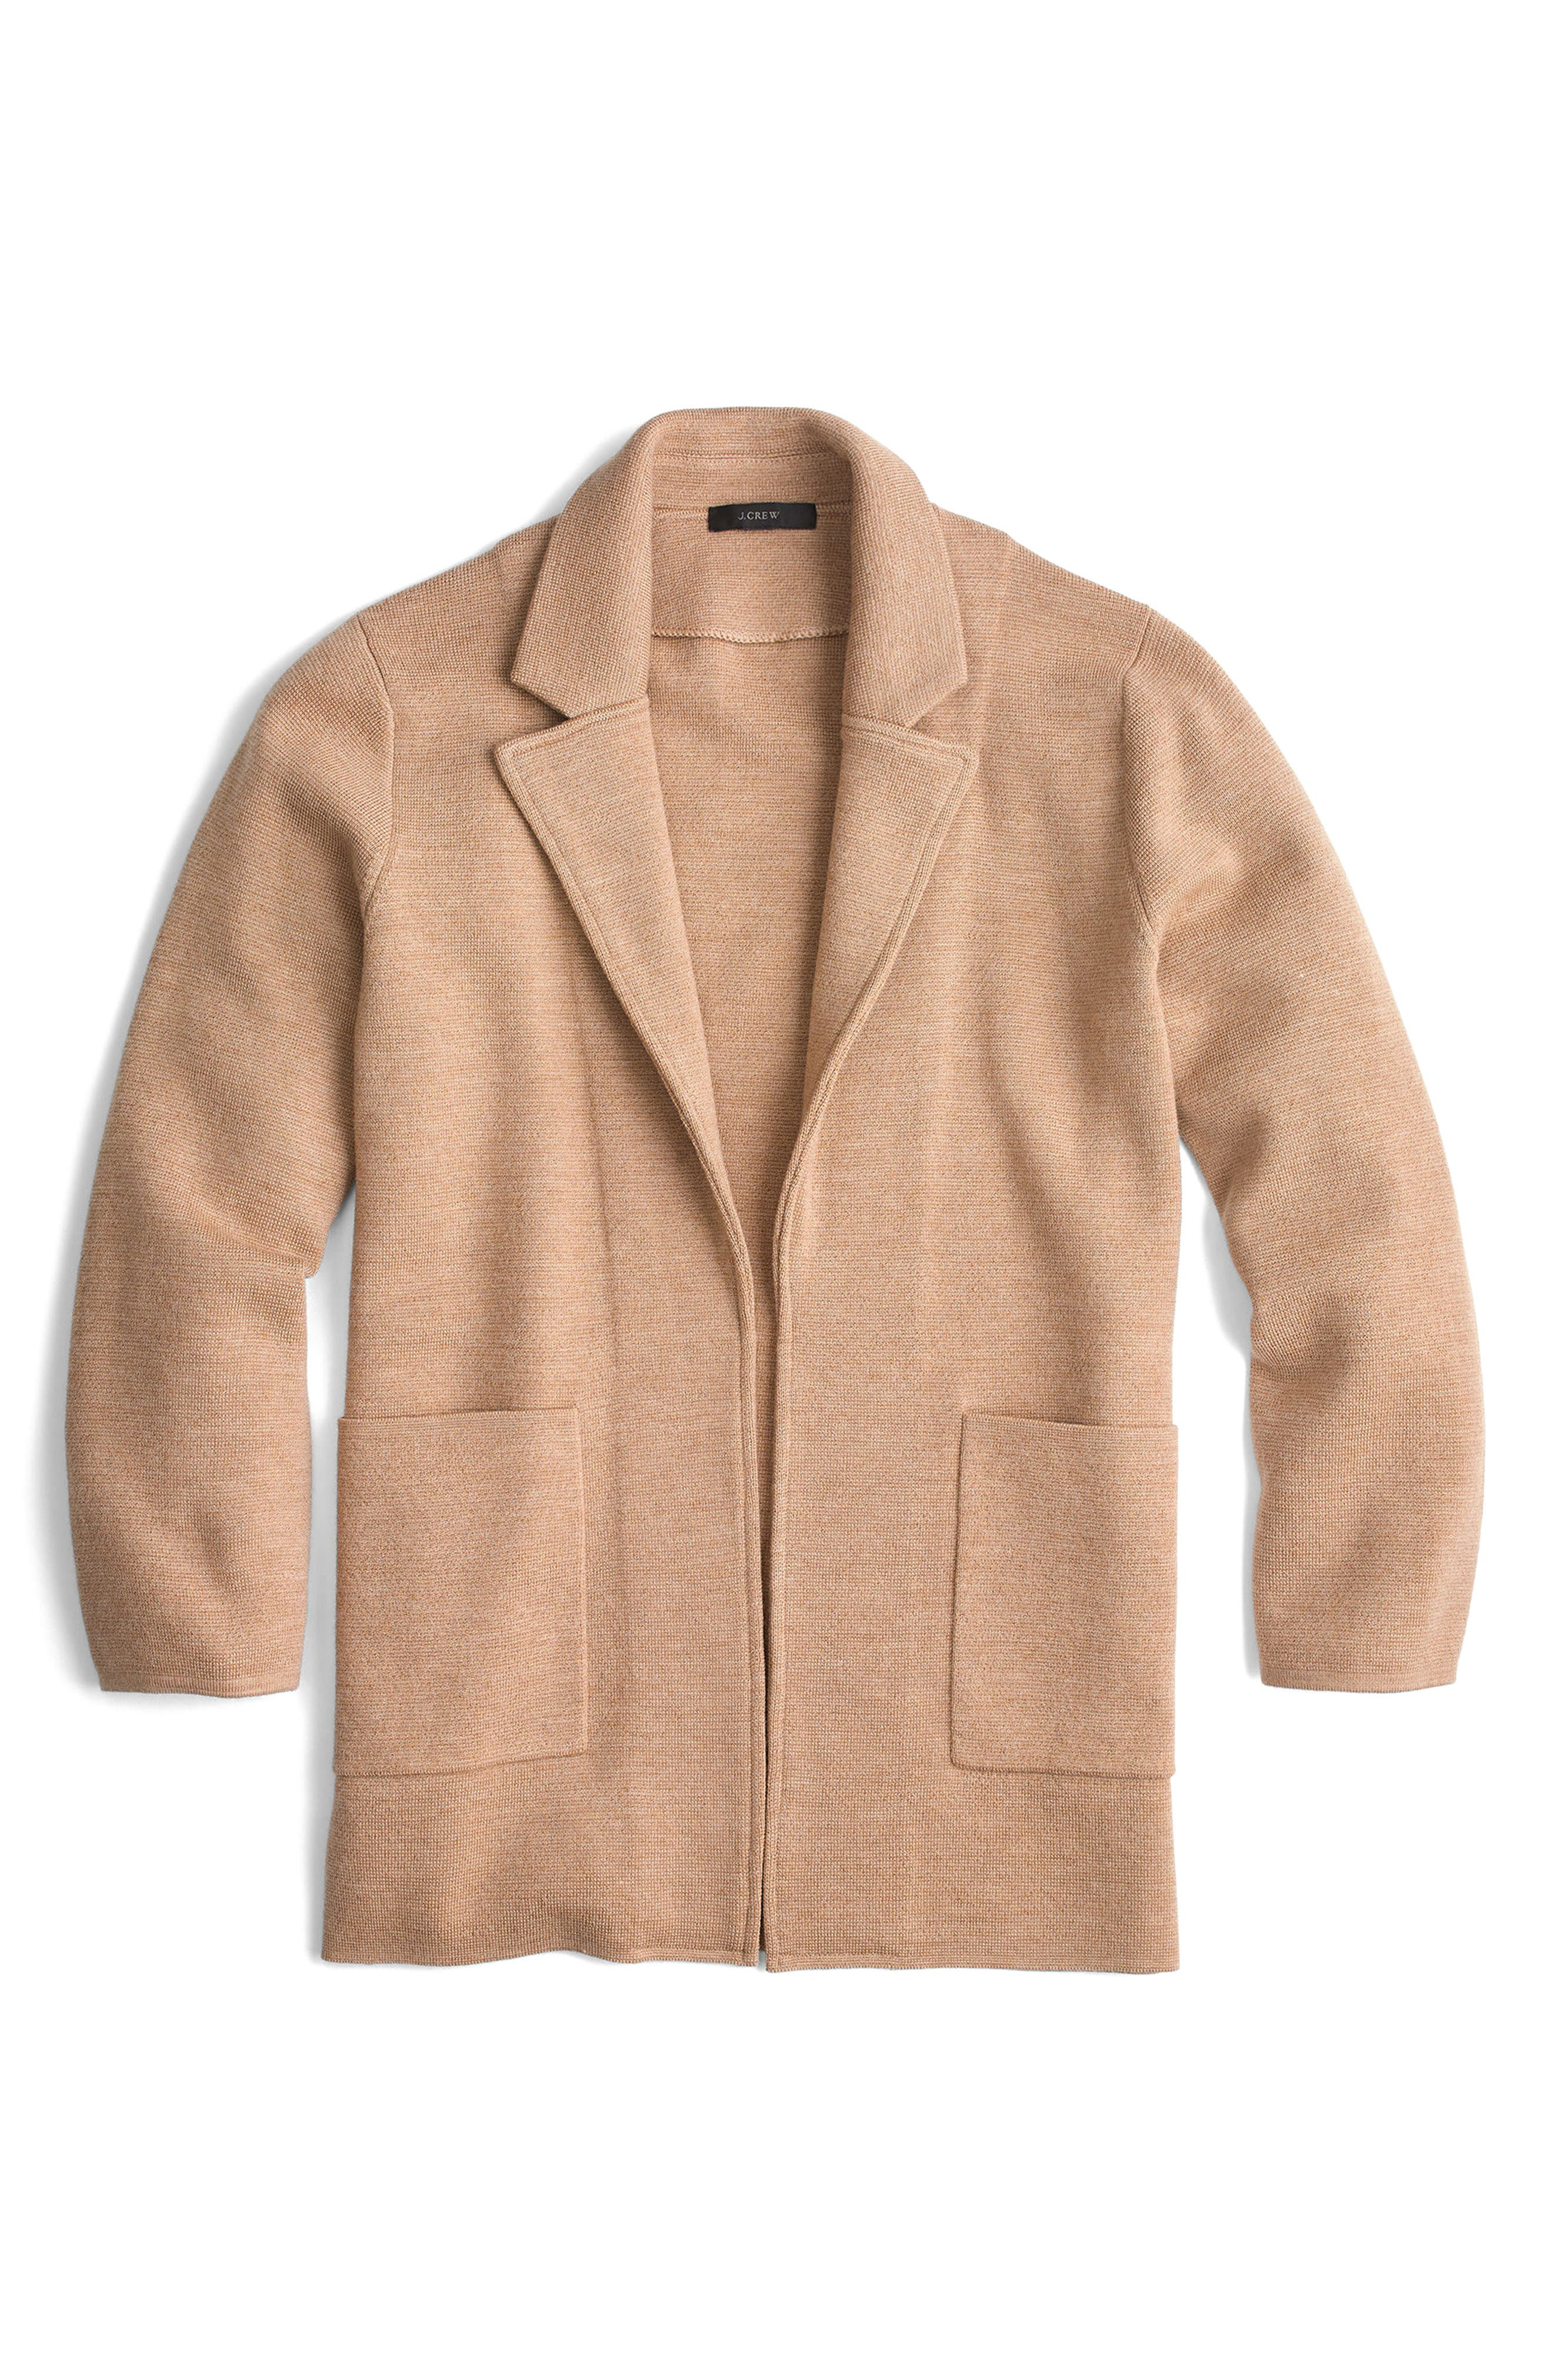 J.Crew Open Front Sweater Blazer